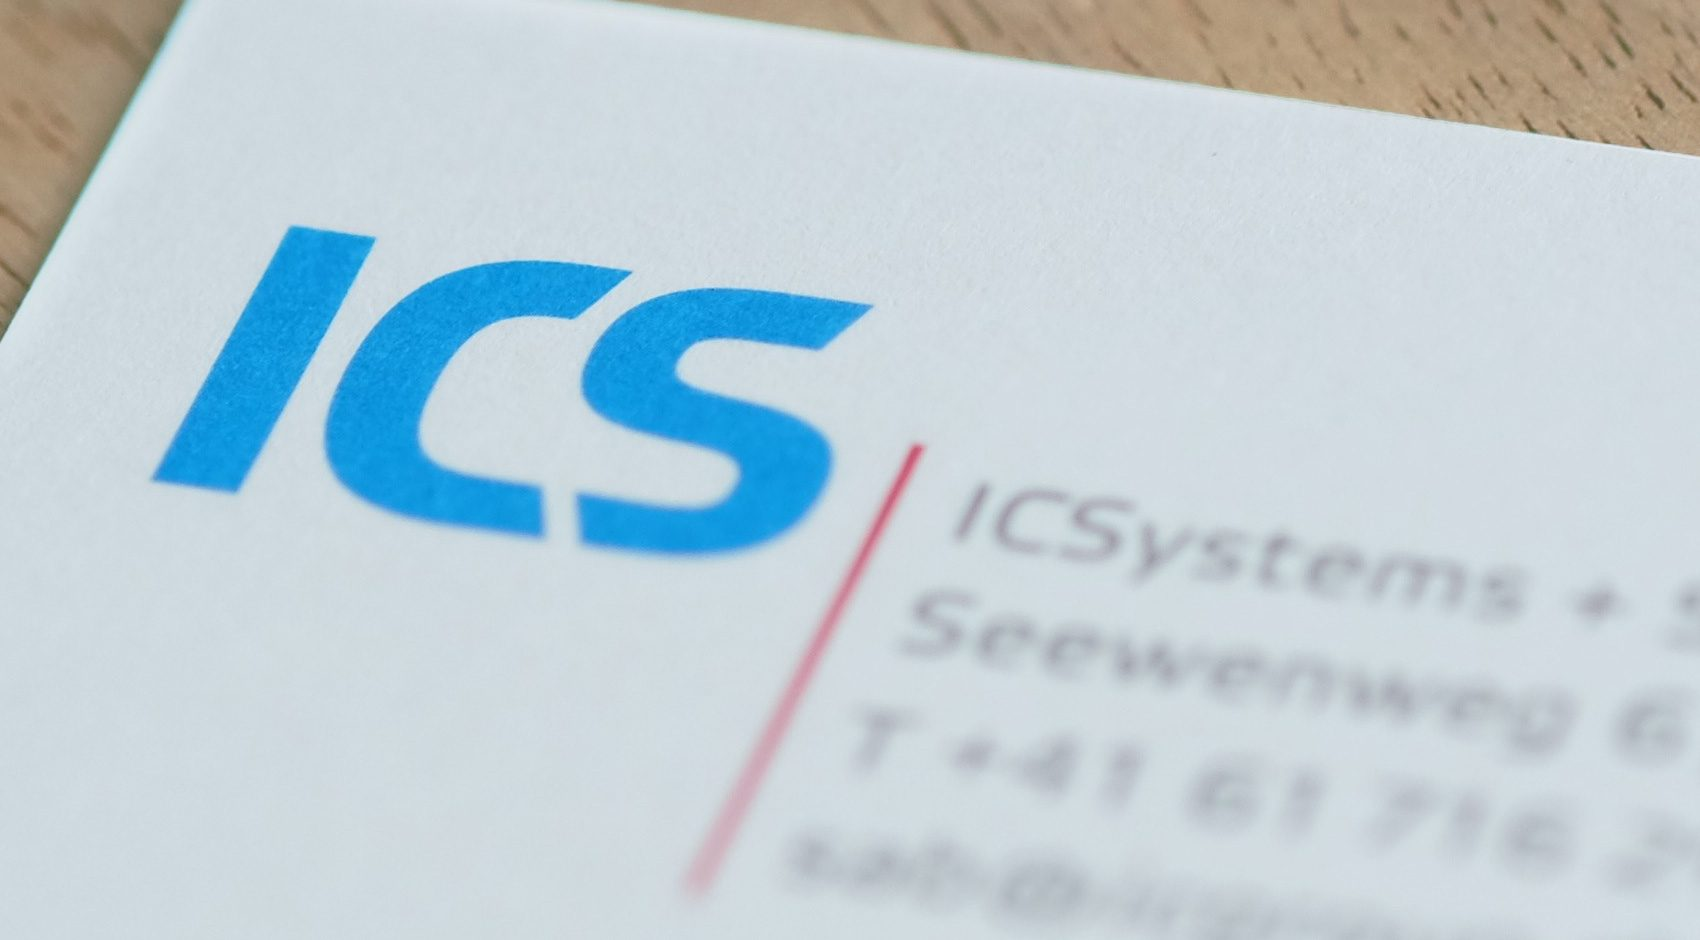 ICSystems